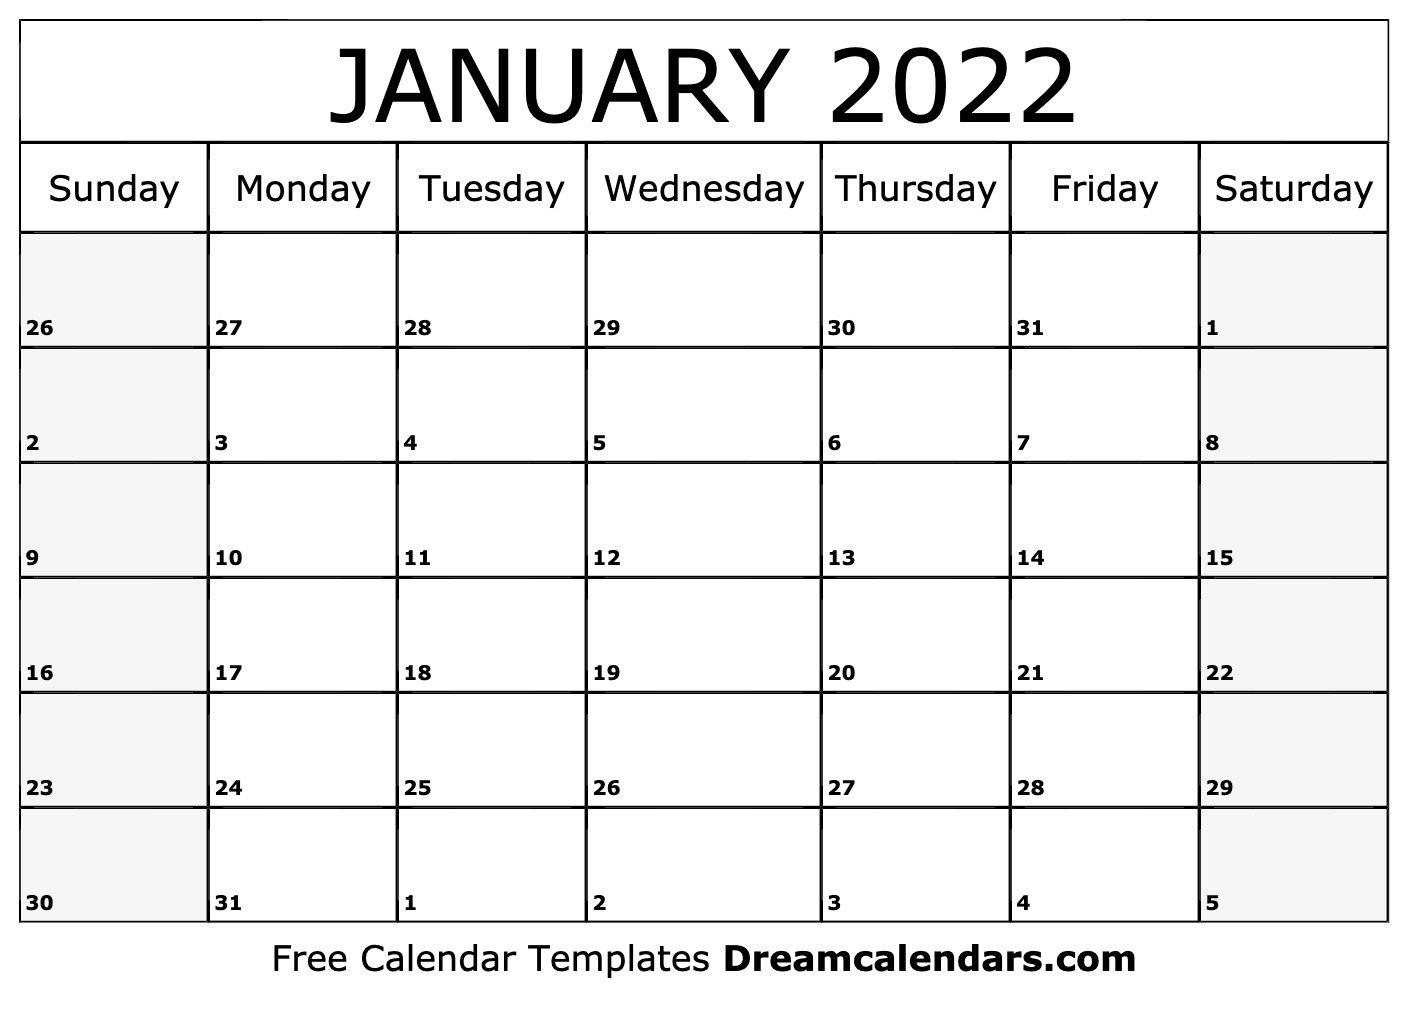 January 2022 Calendar | Free Blank Printable Templates pertaining to Printable Calendar January 2022 Floral Image